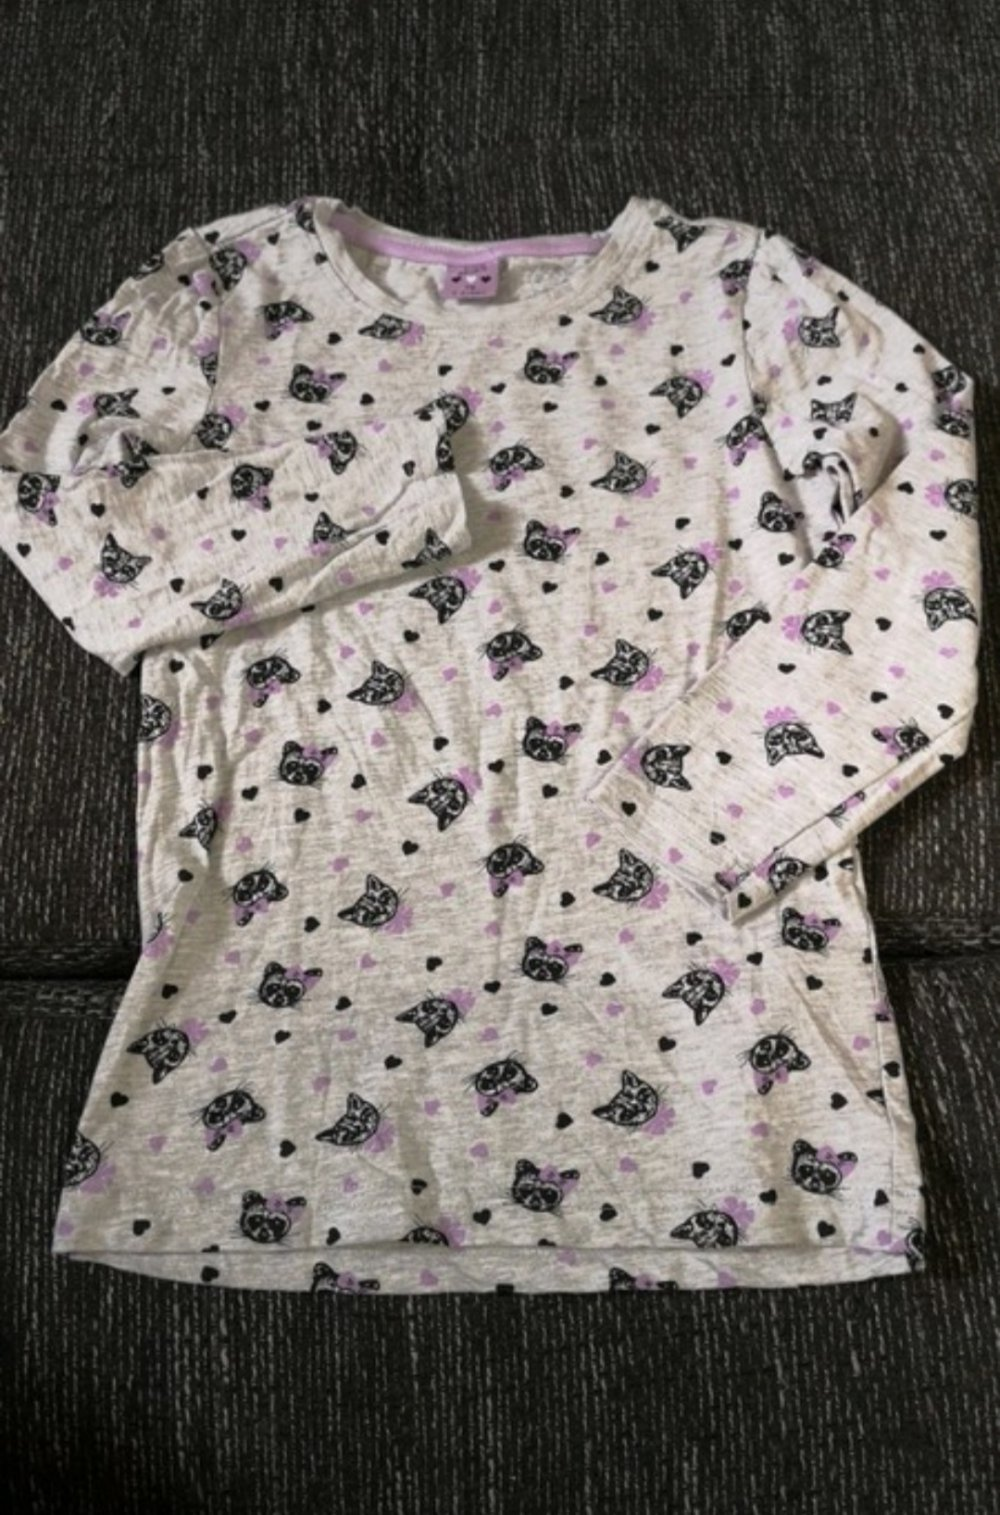 3d090143facb9 Kiki & Koko - Langarm Shirt Mädchen Katzen Waschbär :: Kleiderkorb.de